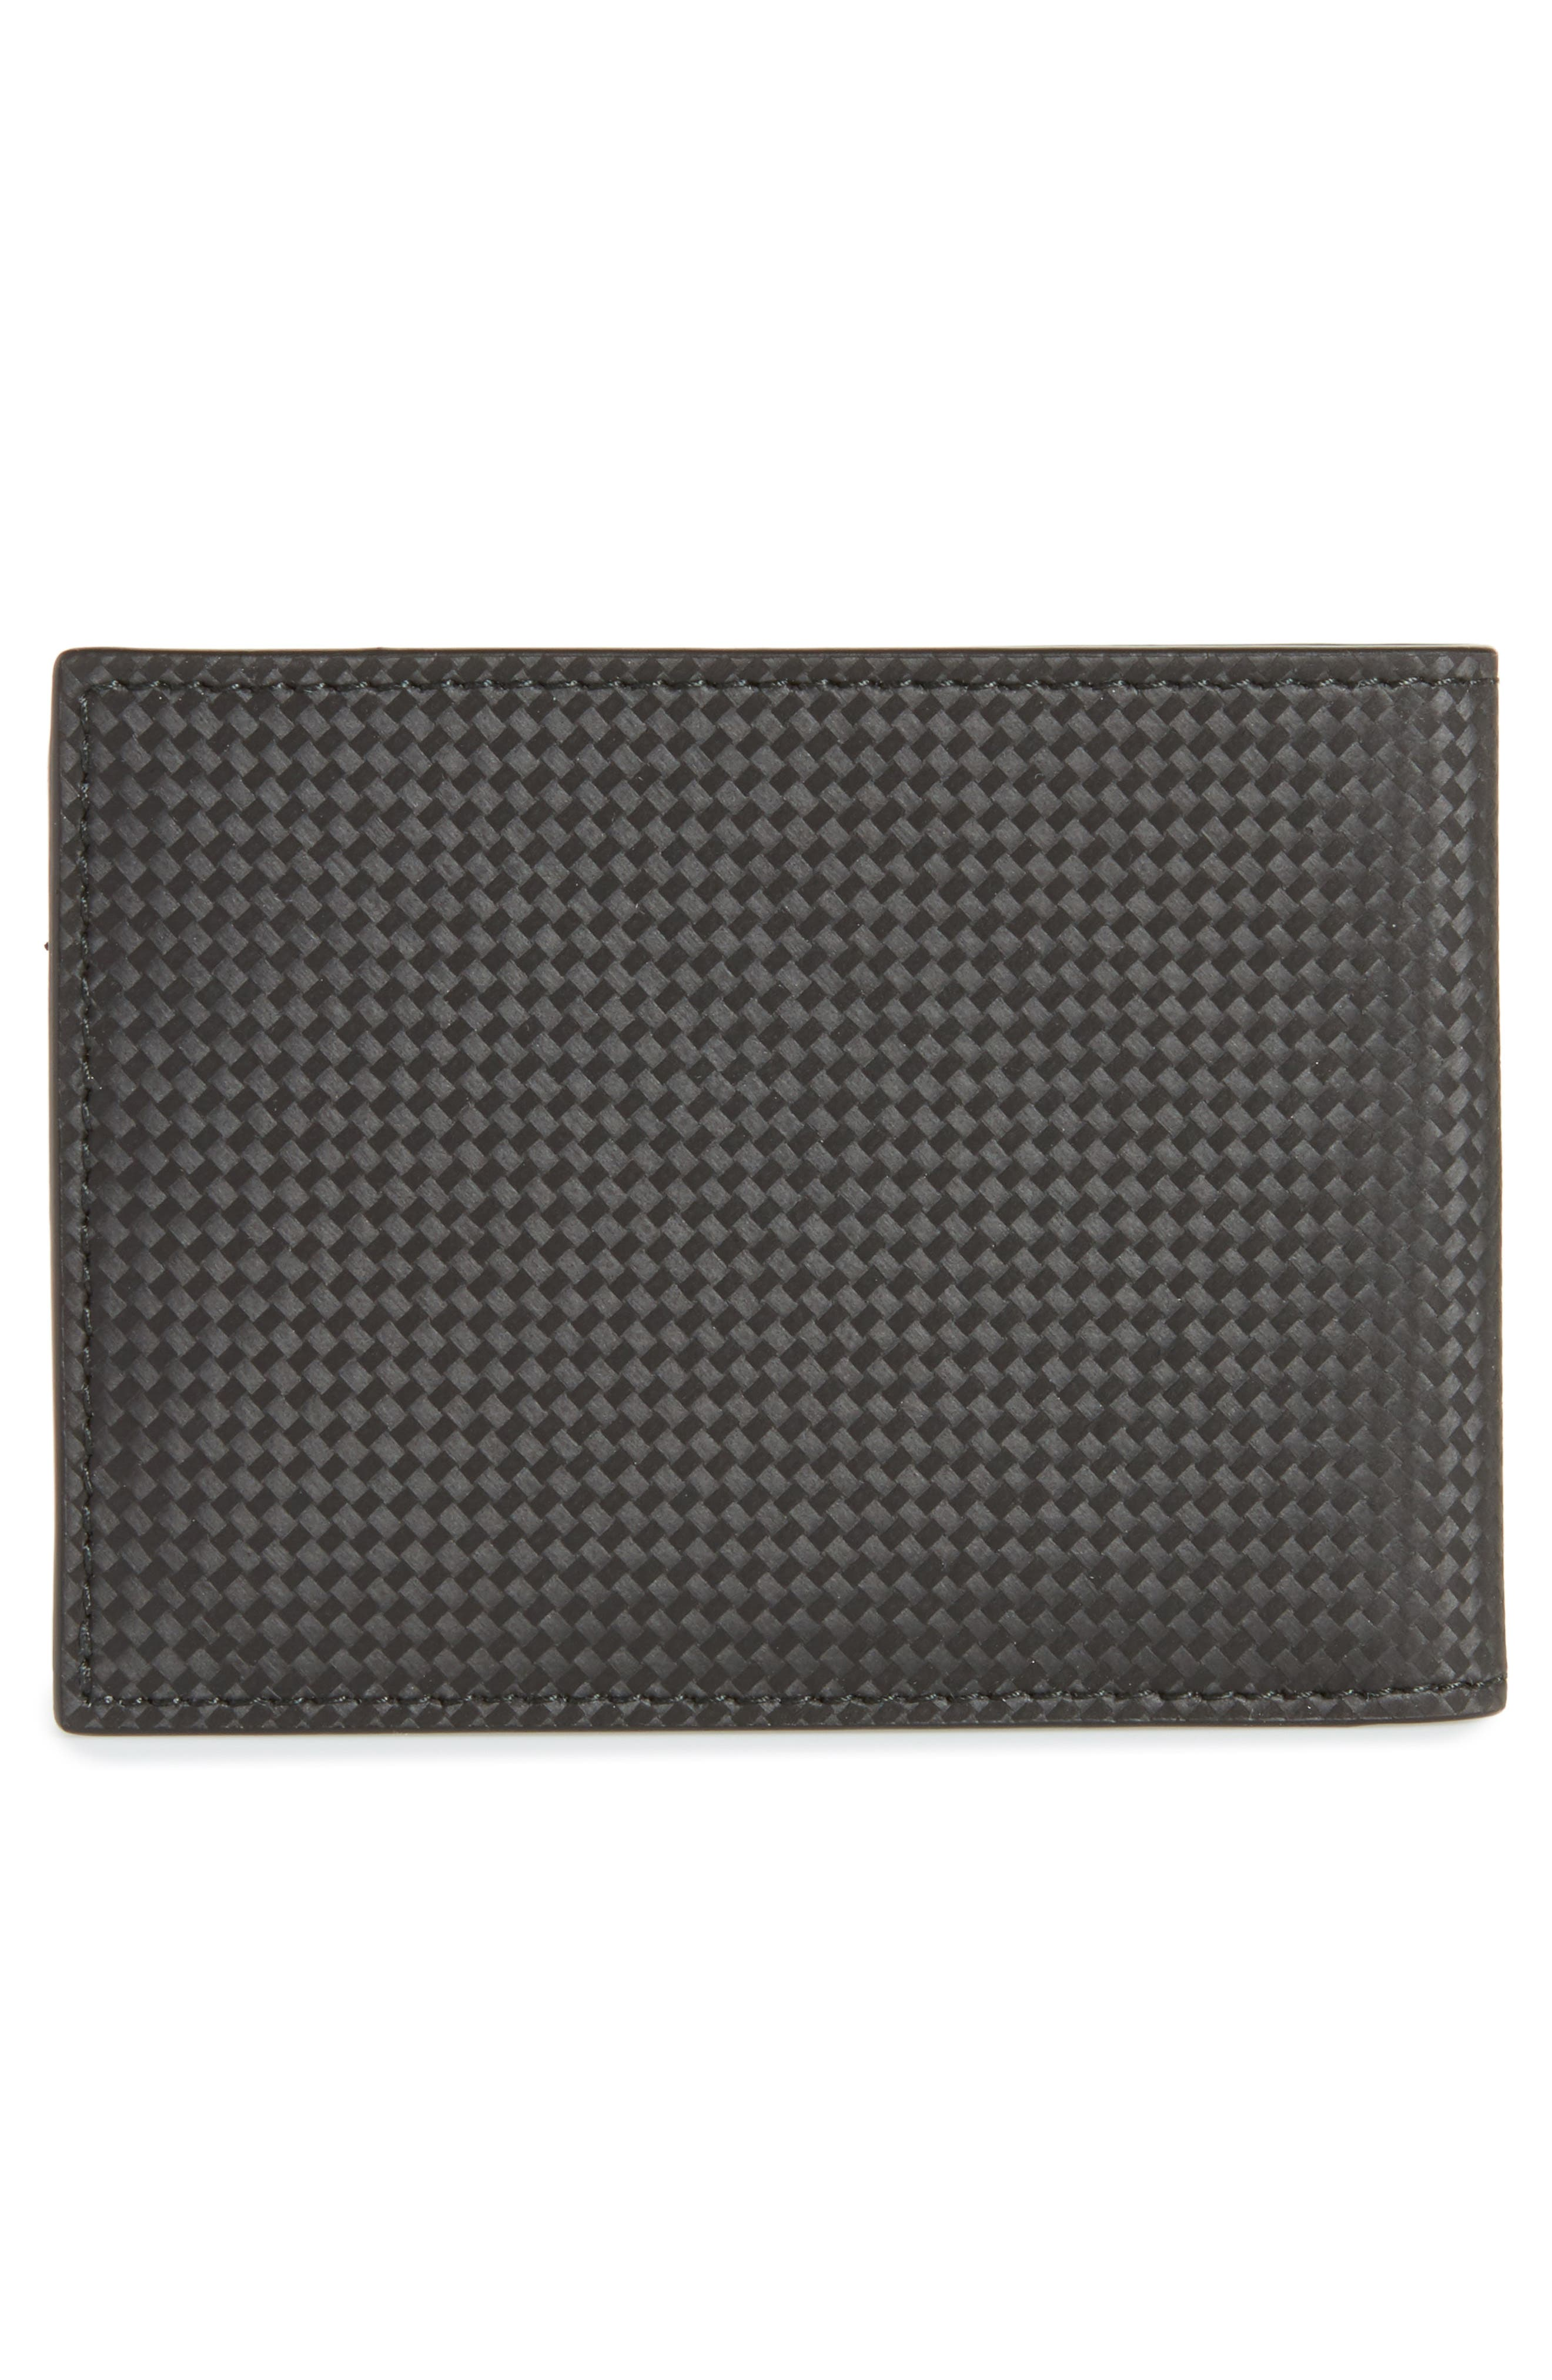 Extreme Leather Wallet,                             Alternate thumbnail 3, color,                             Black